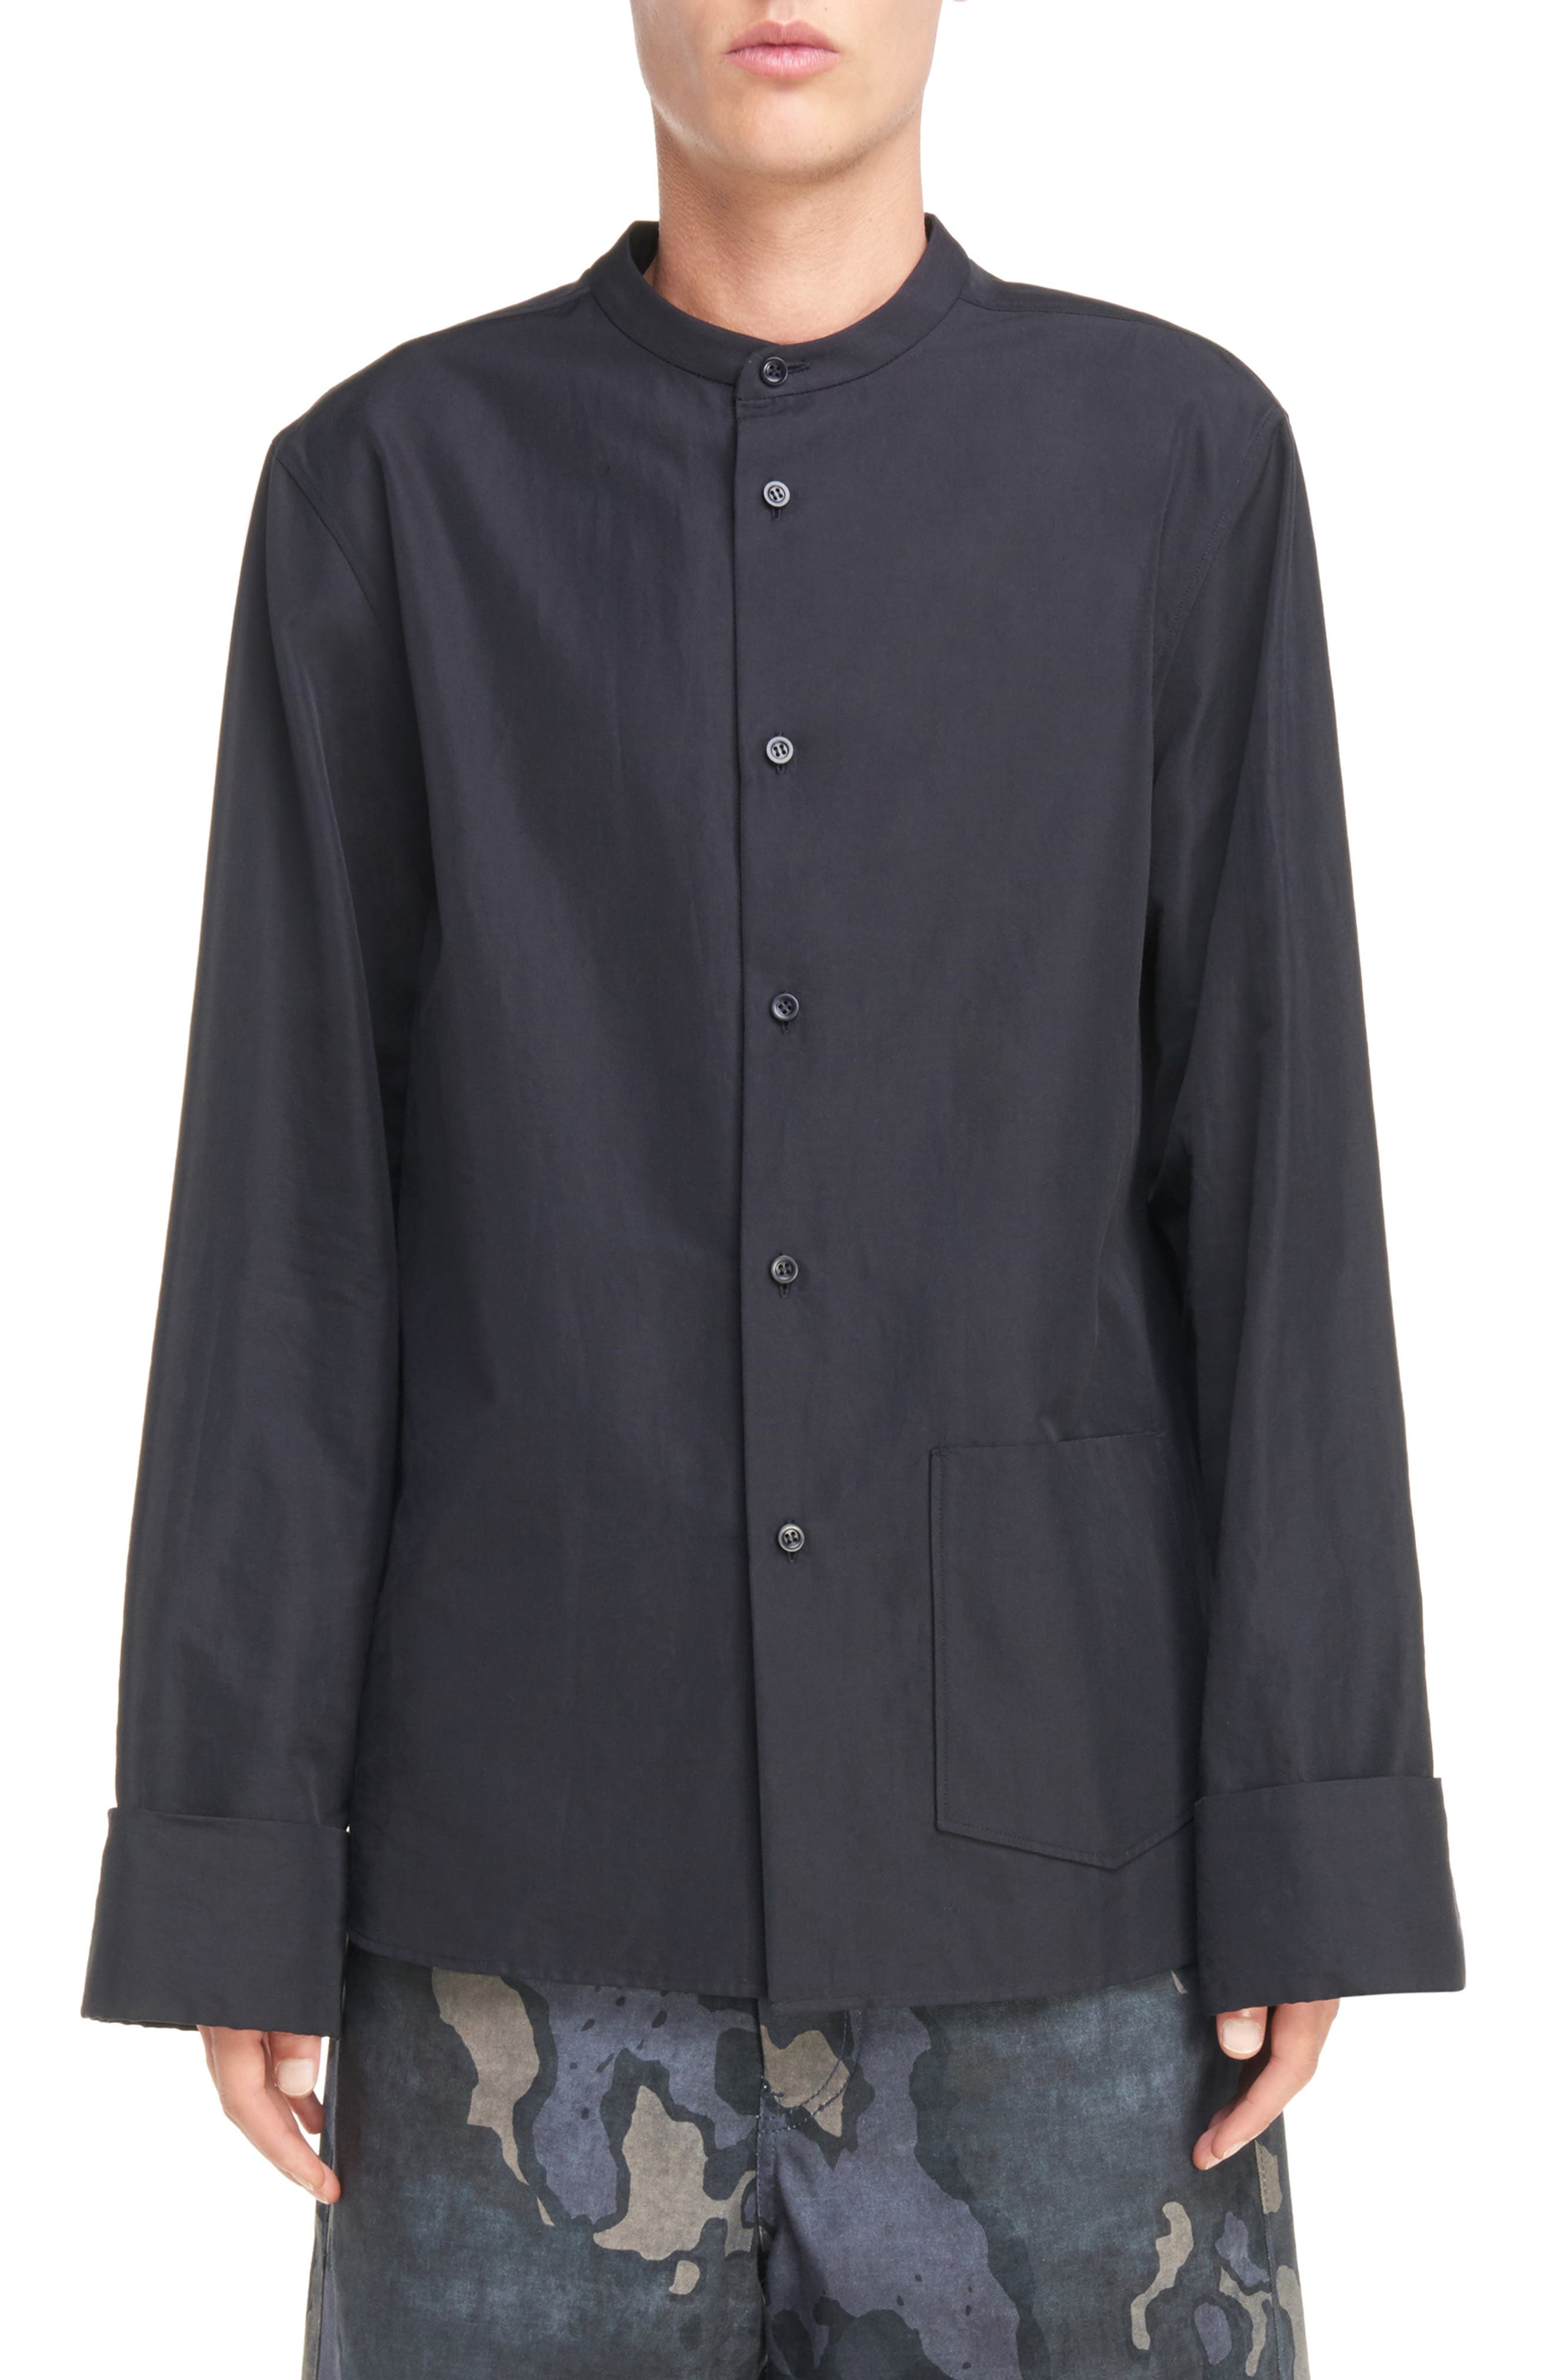 ACNE STUDIOS Maple Oversize Mandarin Collar Shirt